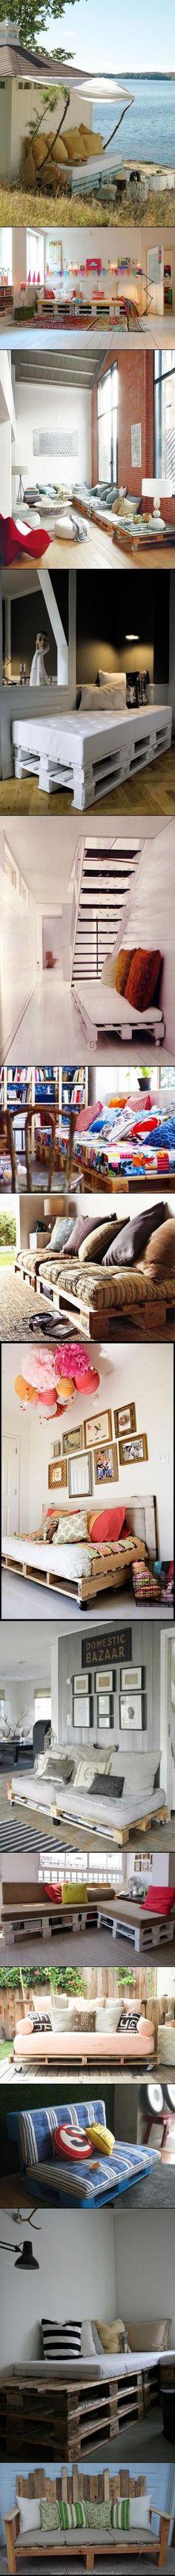 Home Decor DIY TOP-15 PALLET SOFA IDEAS by Ирина Дубровская